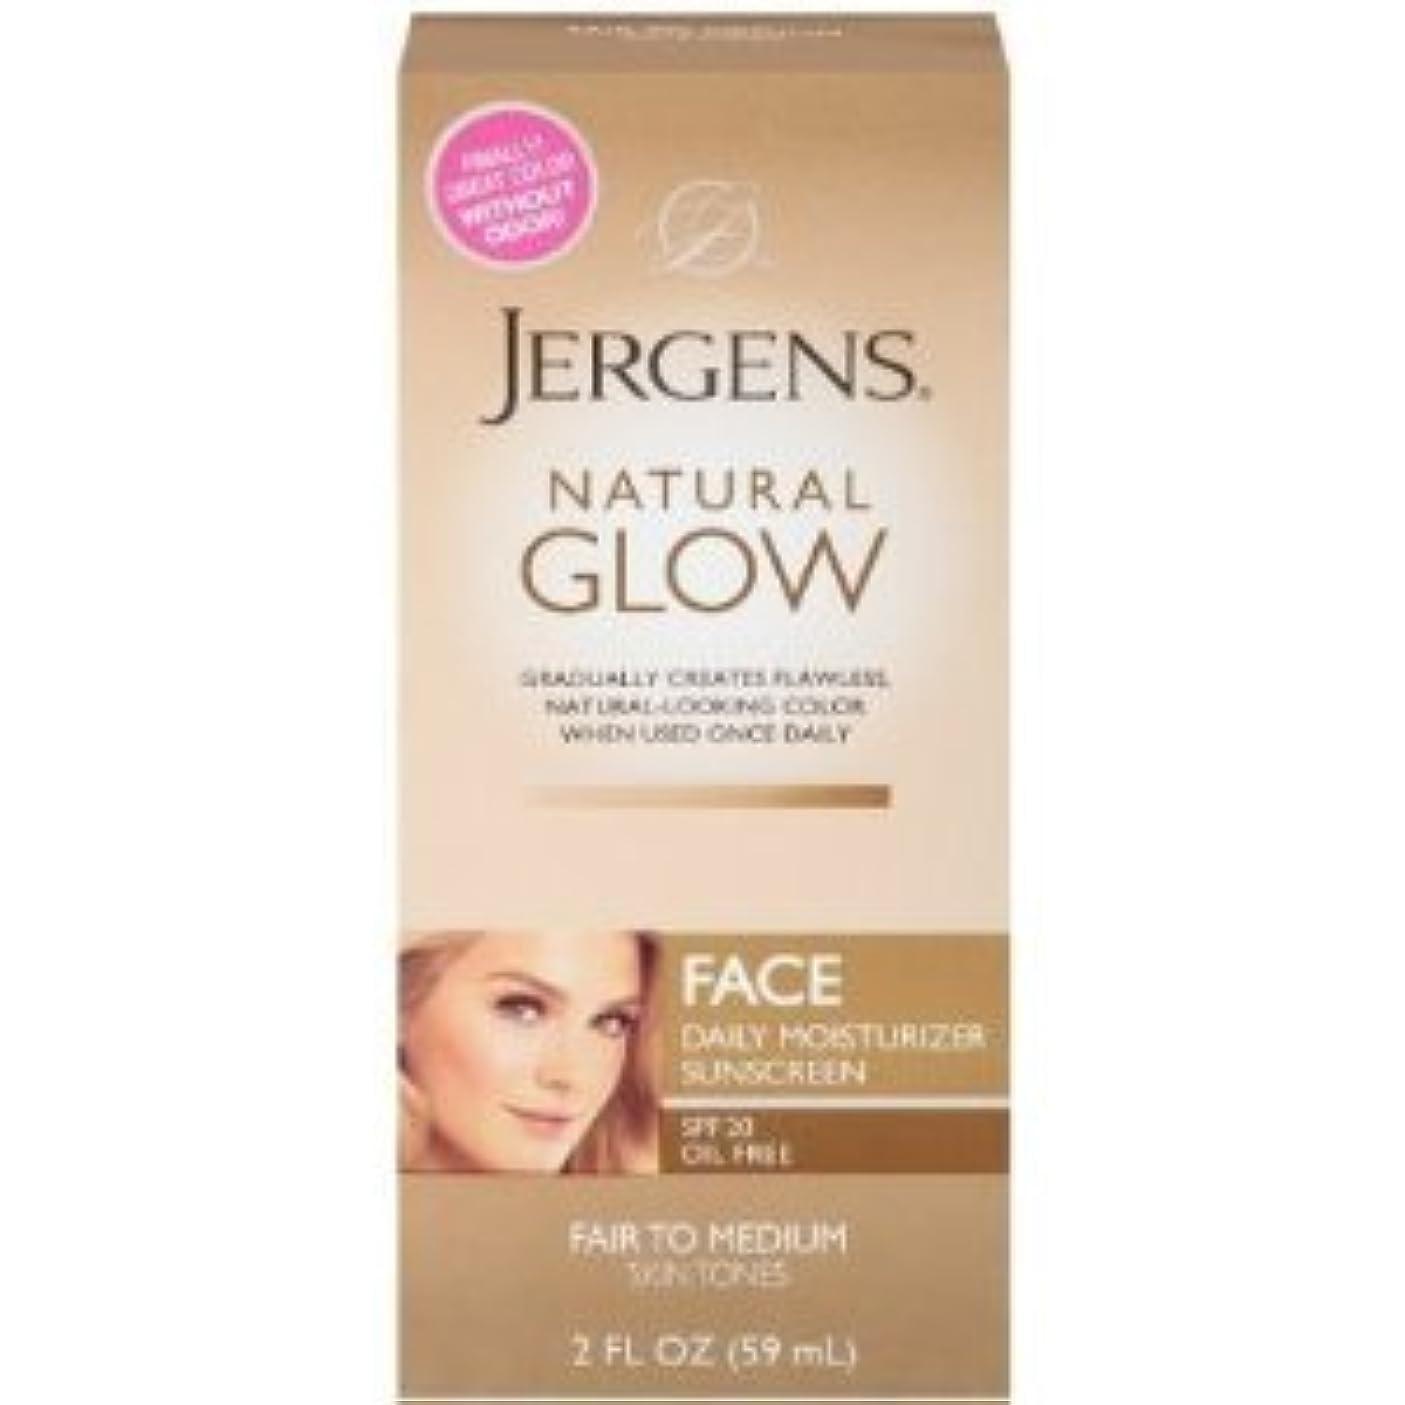 身元本体効能Natural Glow Healthy Complexion Daily Facial Moisturizer, SPF 20, Fair to Medium Tan, (59ml) (海外直送品)